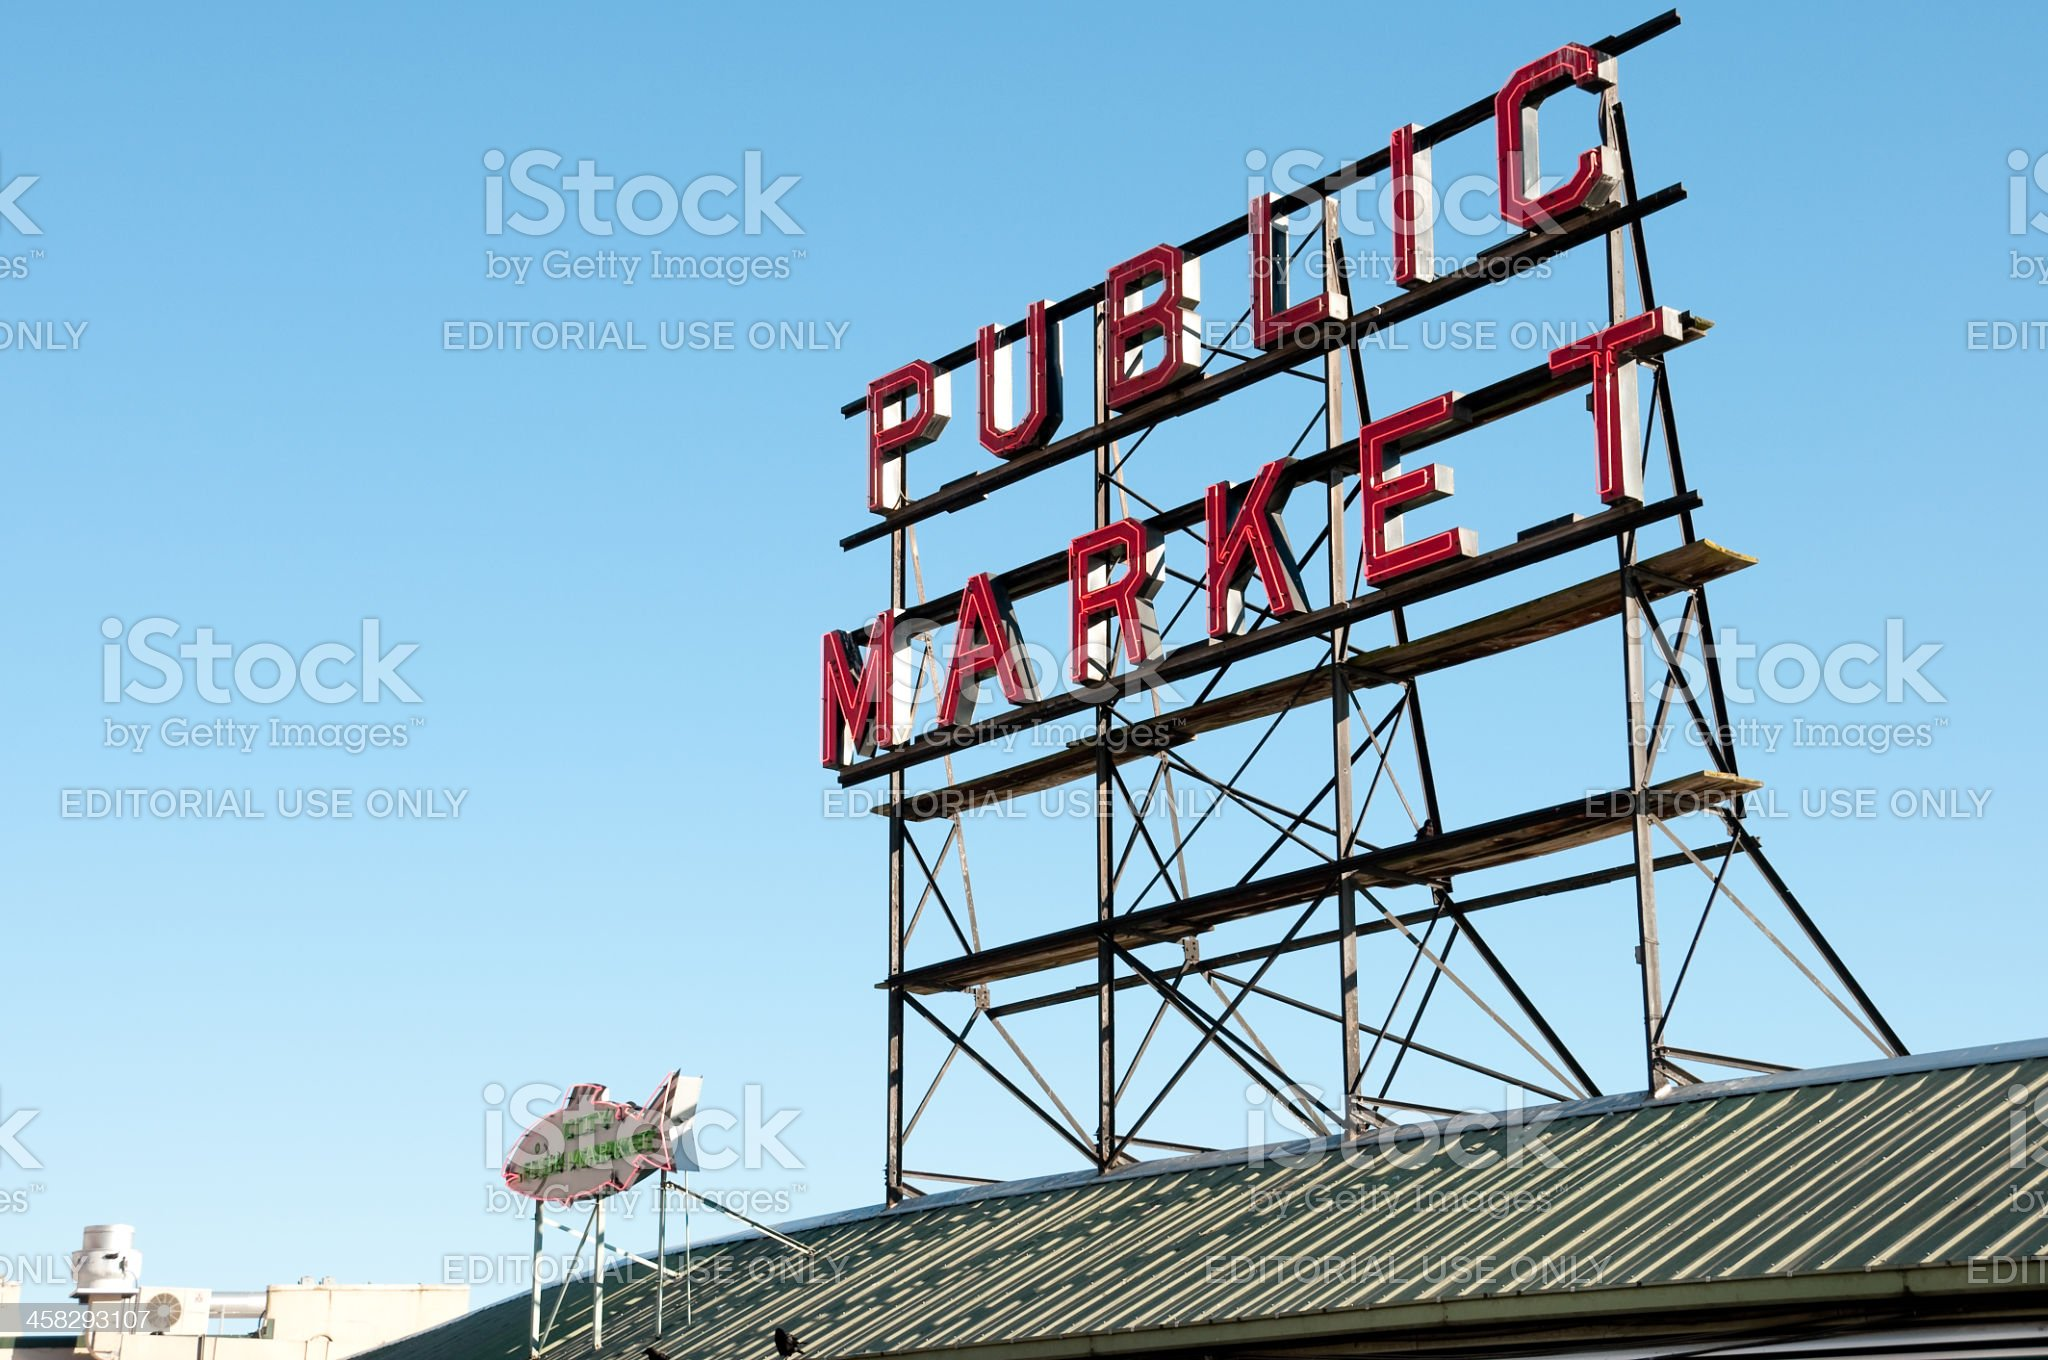 Public Market royalty-free stock photo